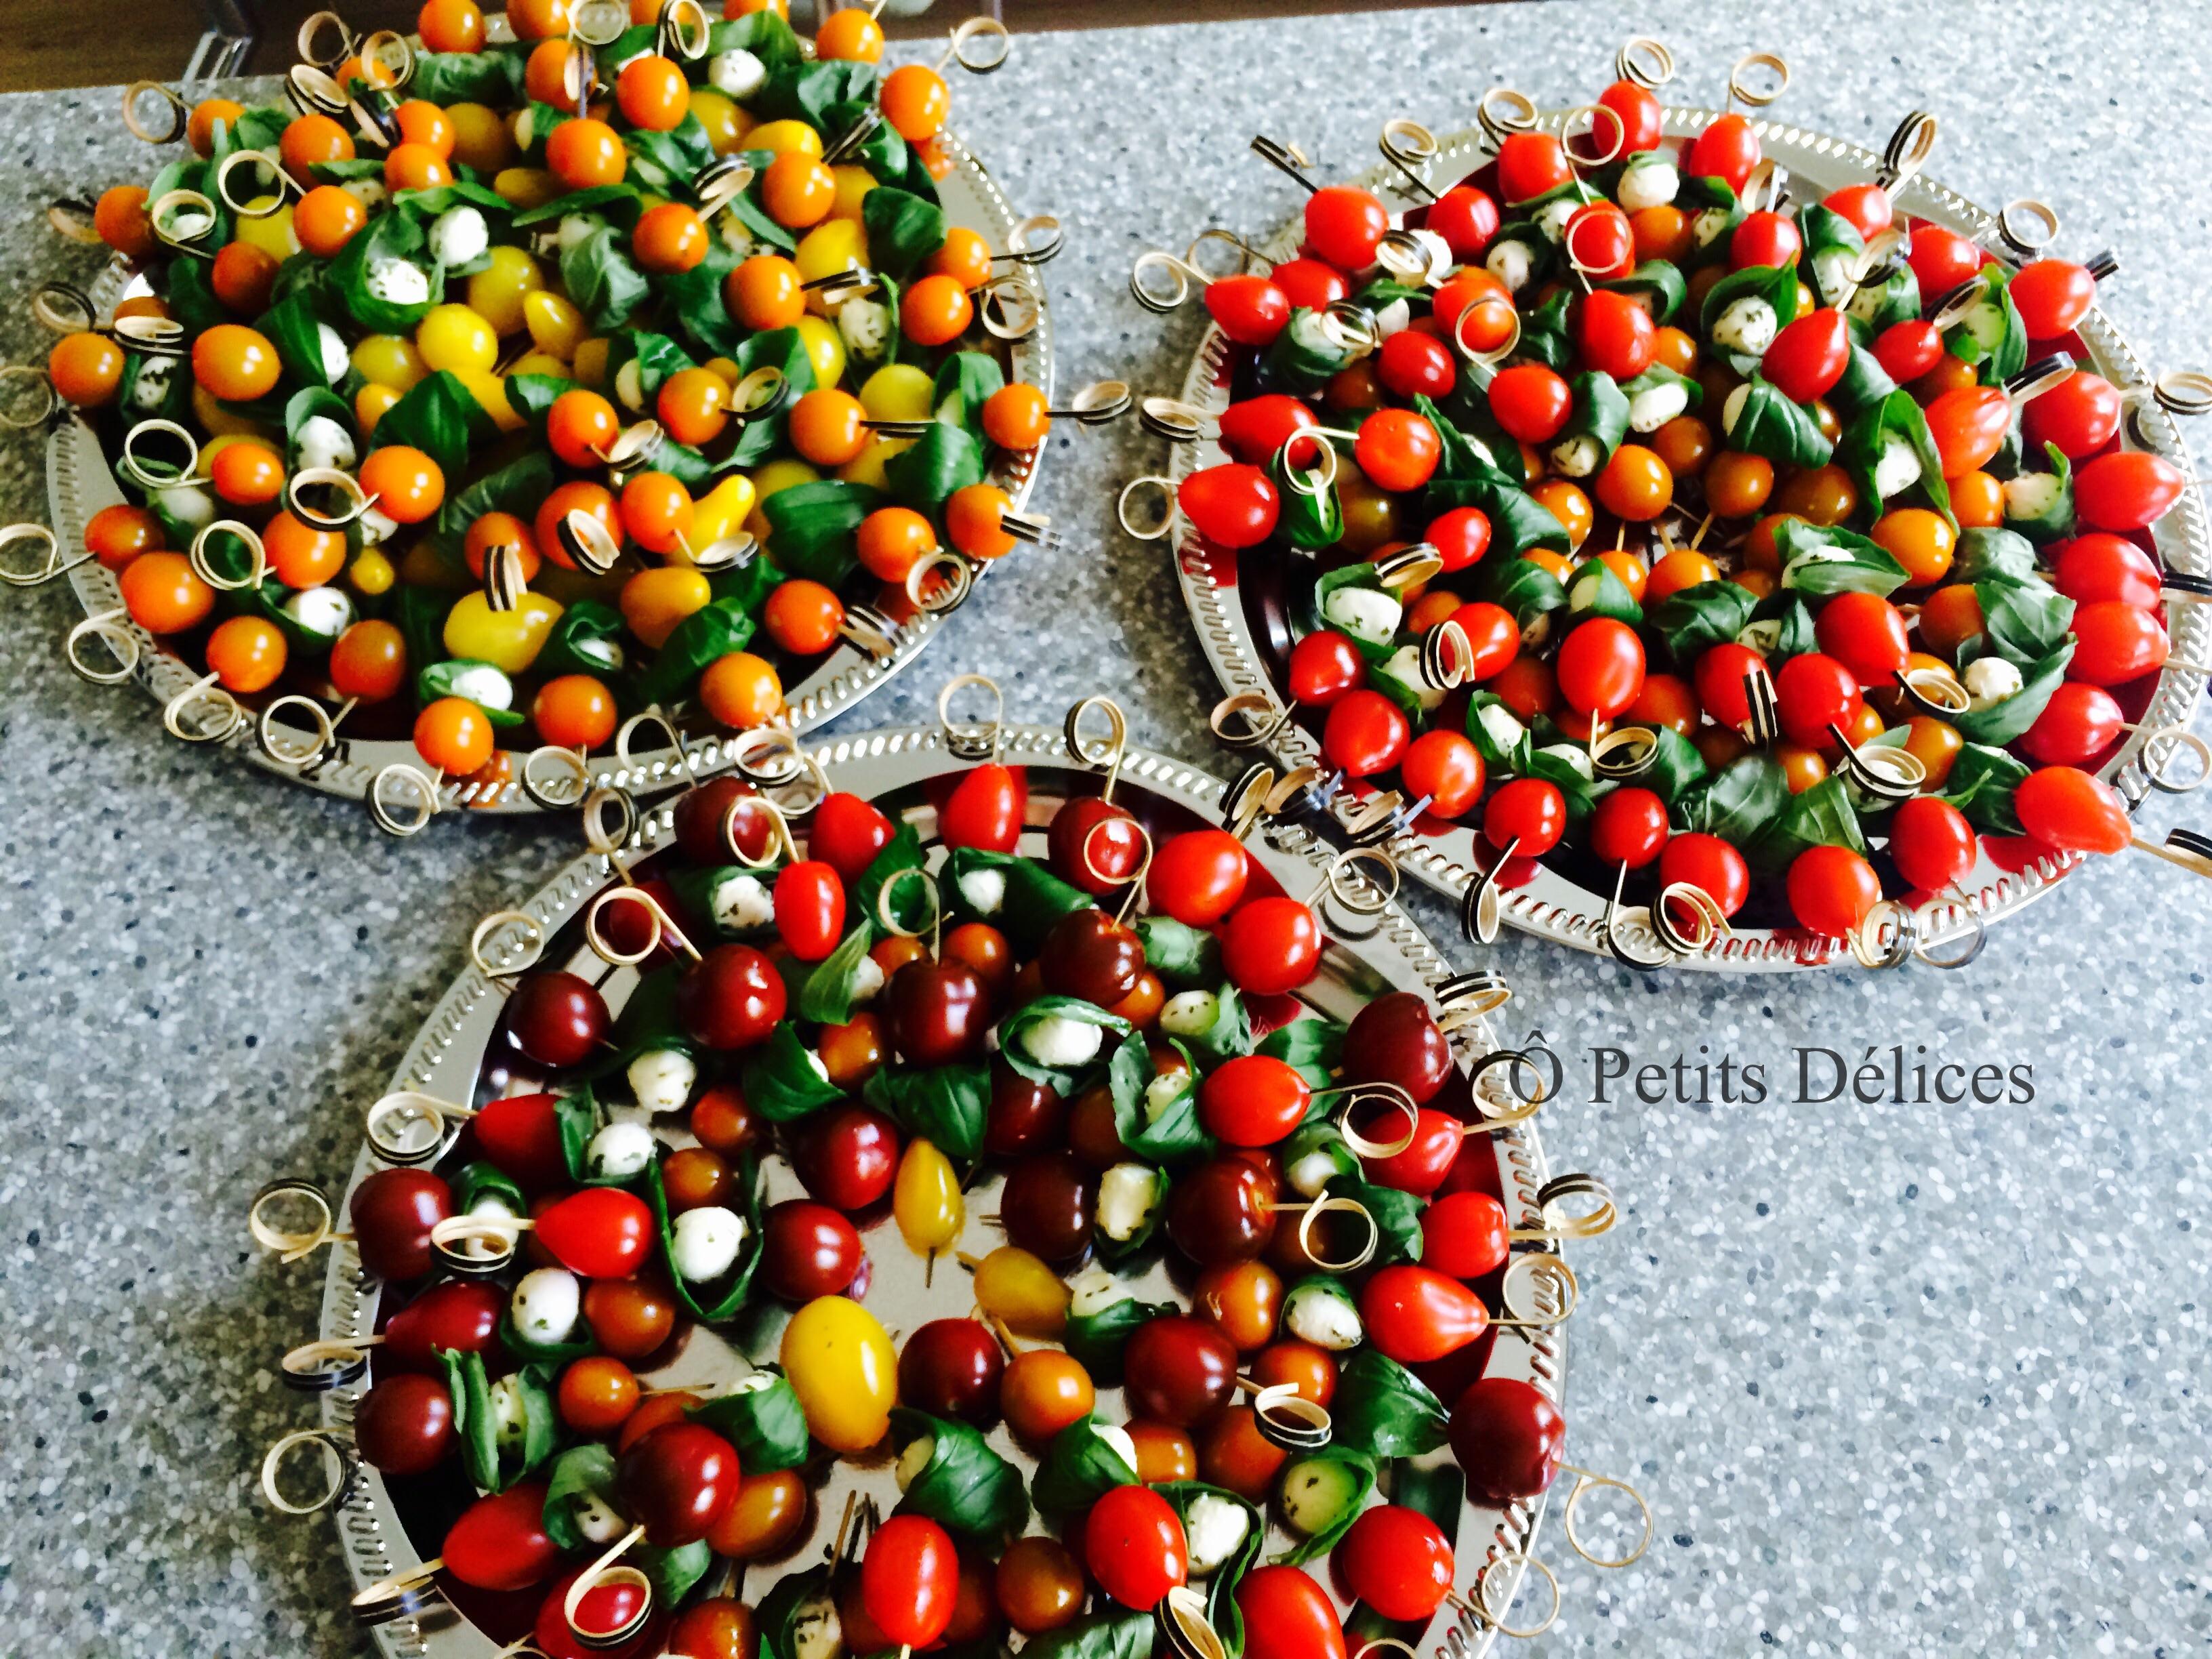 Tomaten-Mozzarella-Spiessli